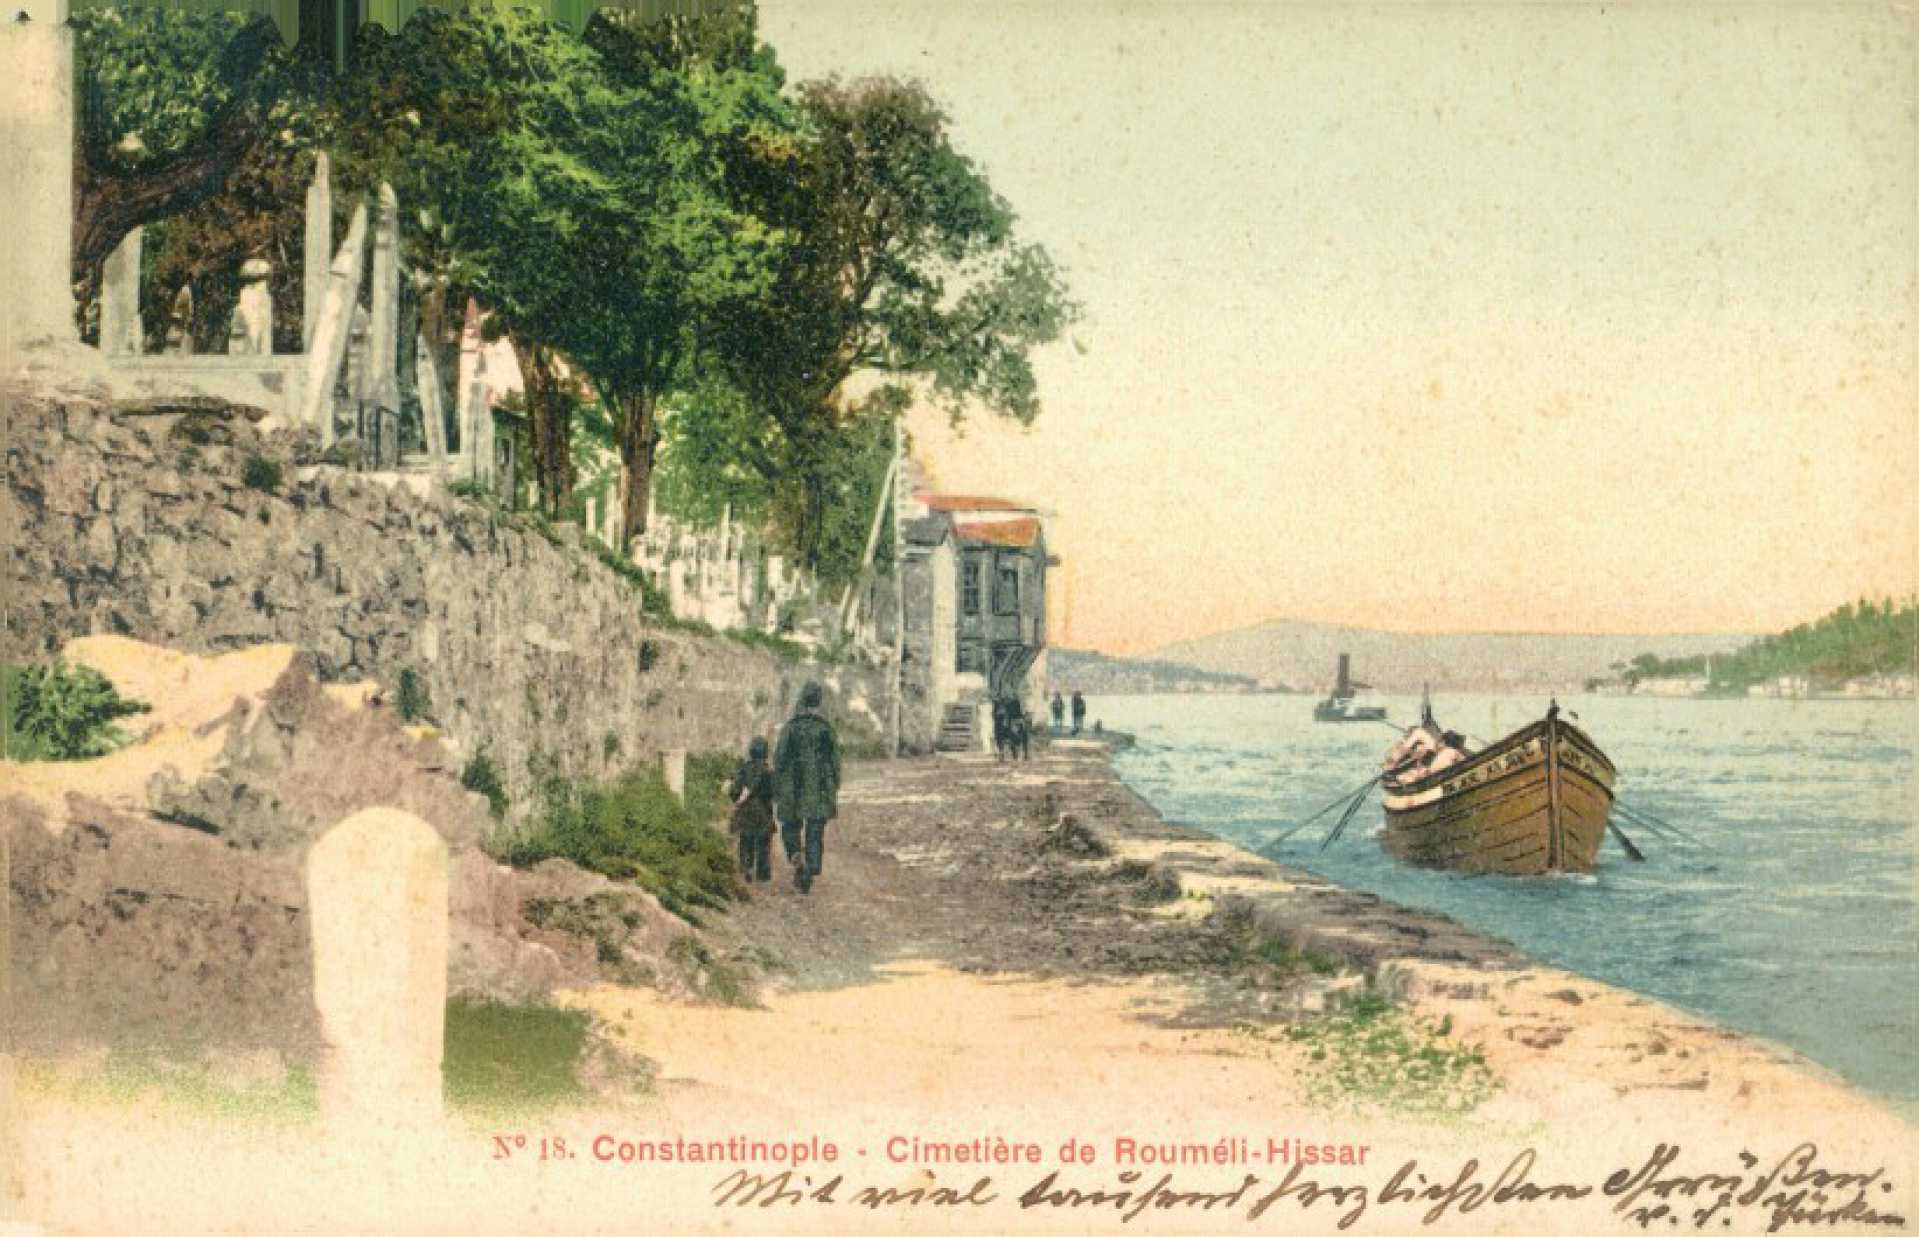 Constantinople – Cimetiere de Roumeli – Hissar